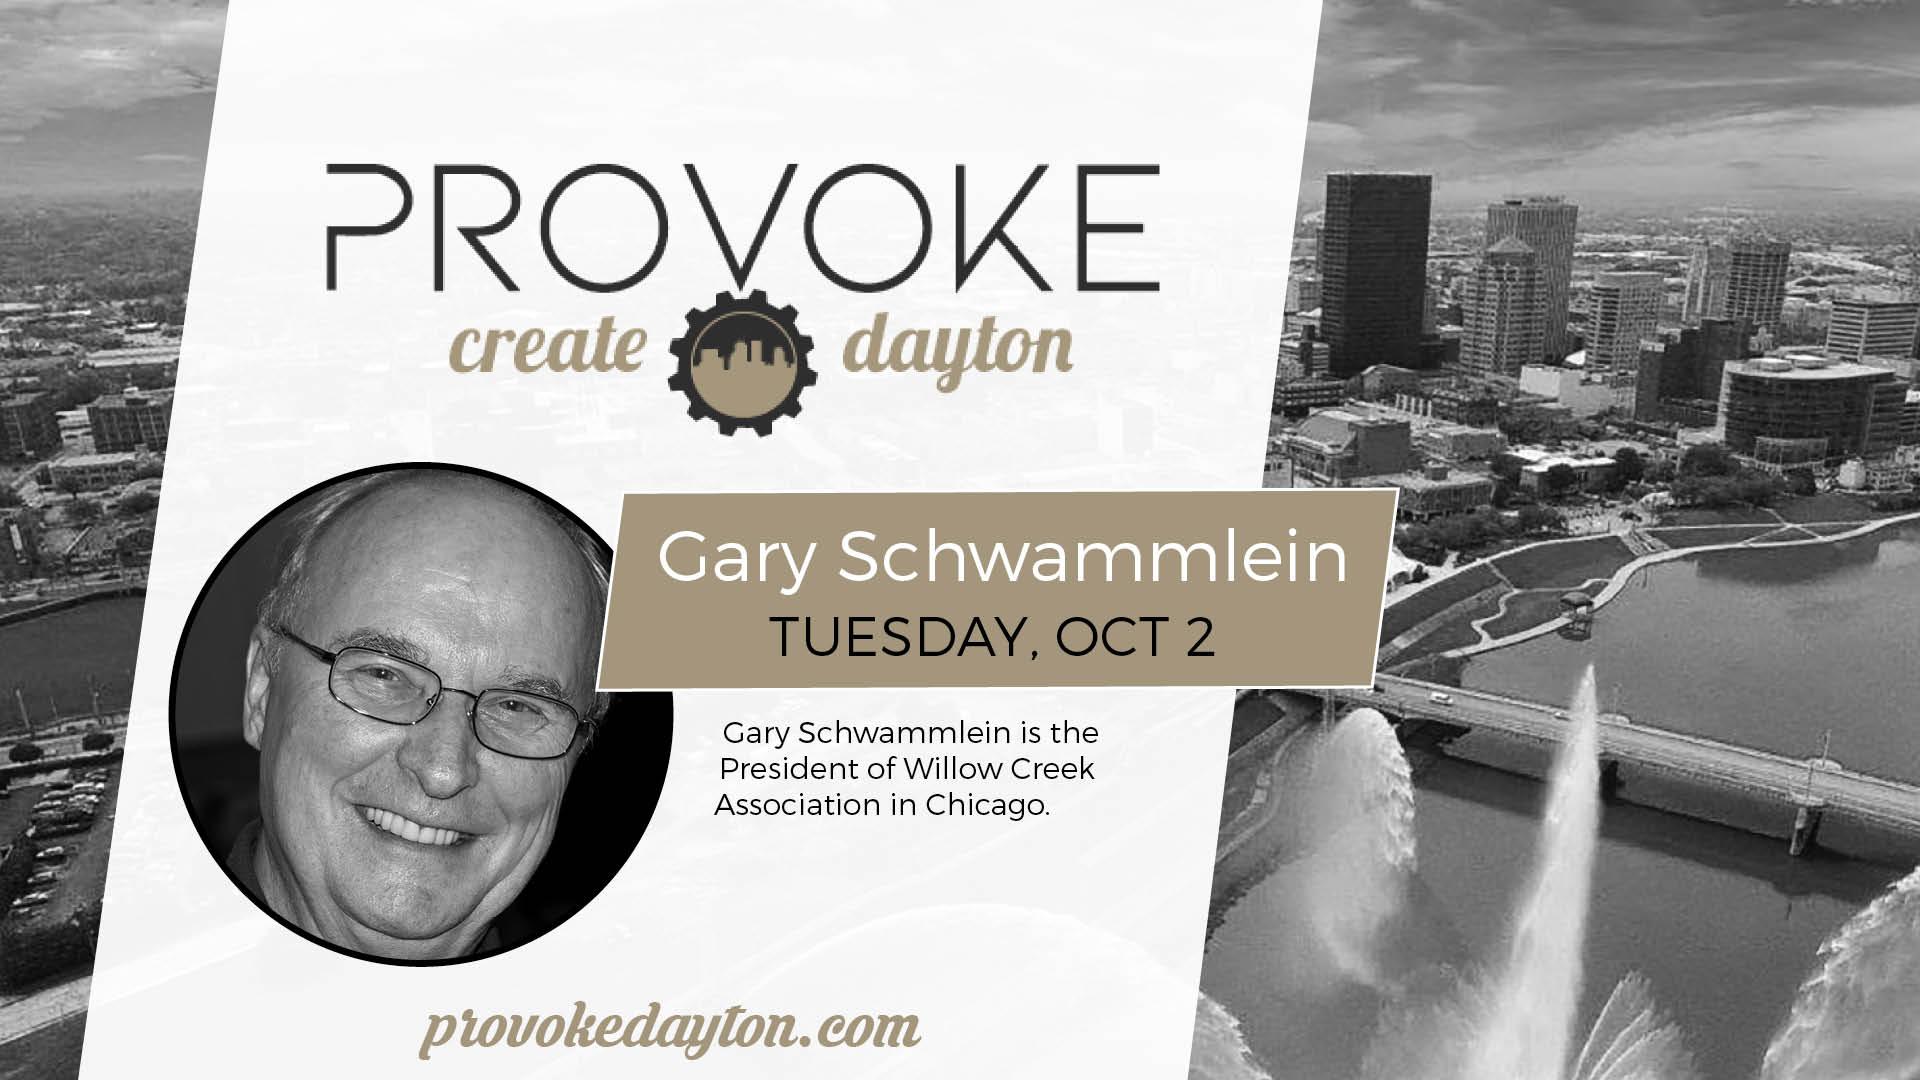 10/2/18 Gary Schwammlein